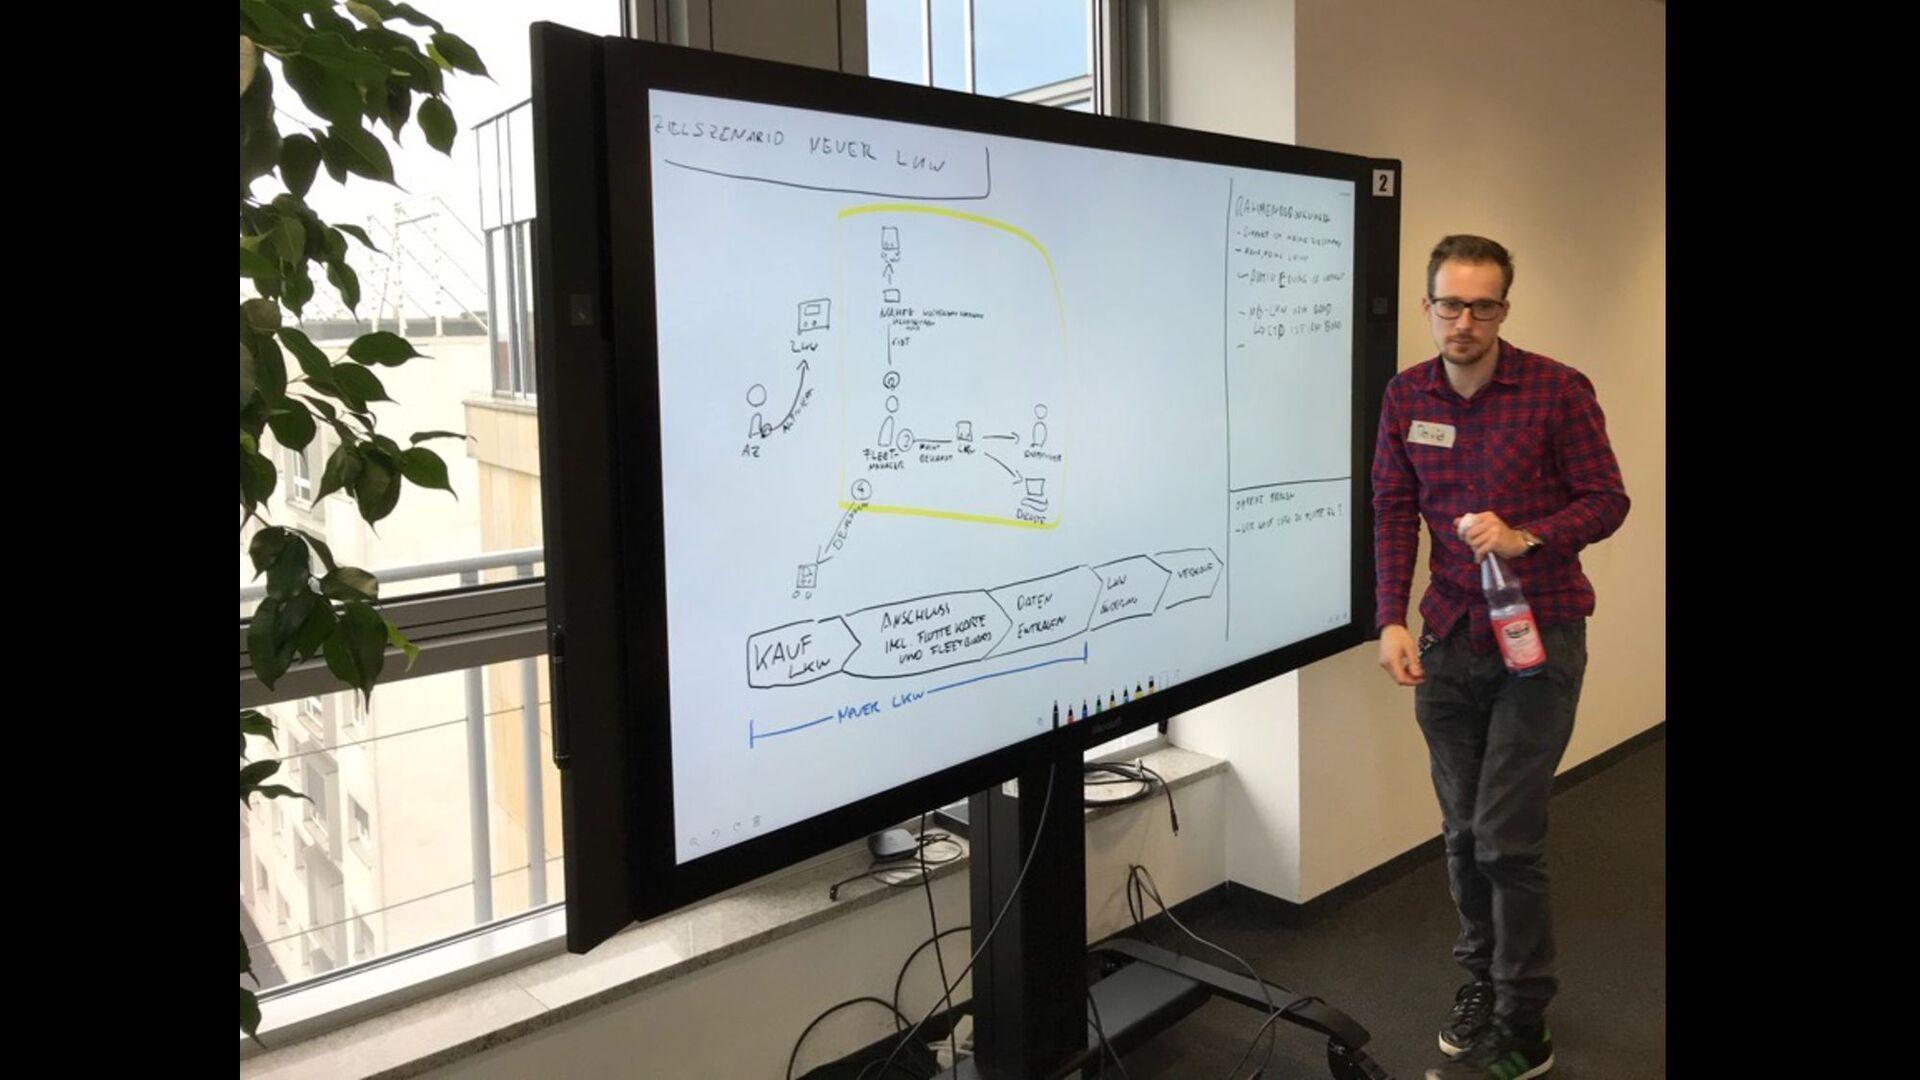 @hschwentner The One Big Model